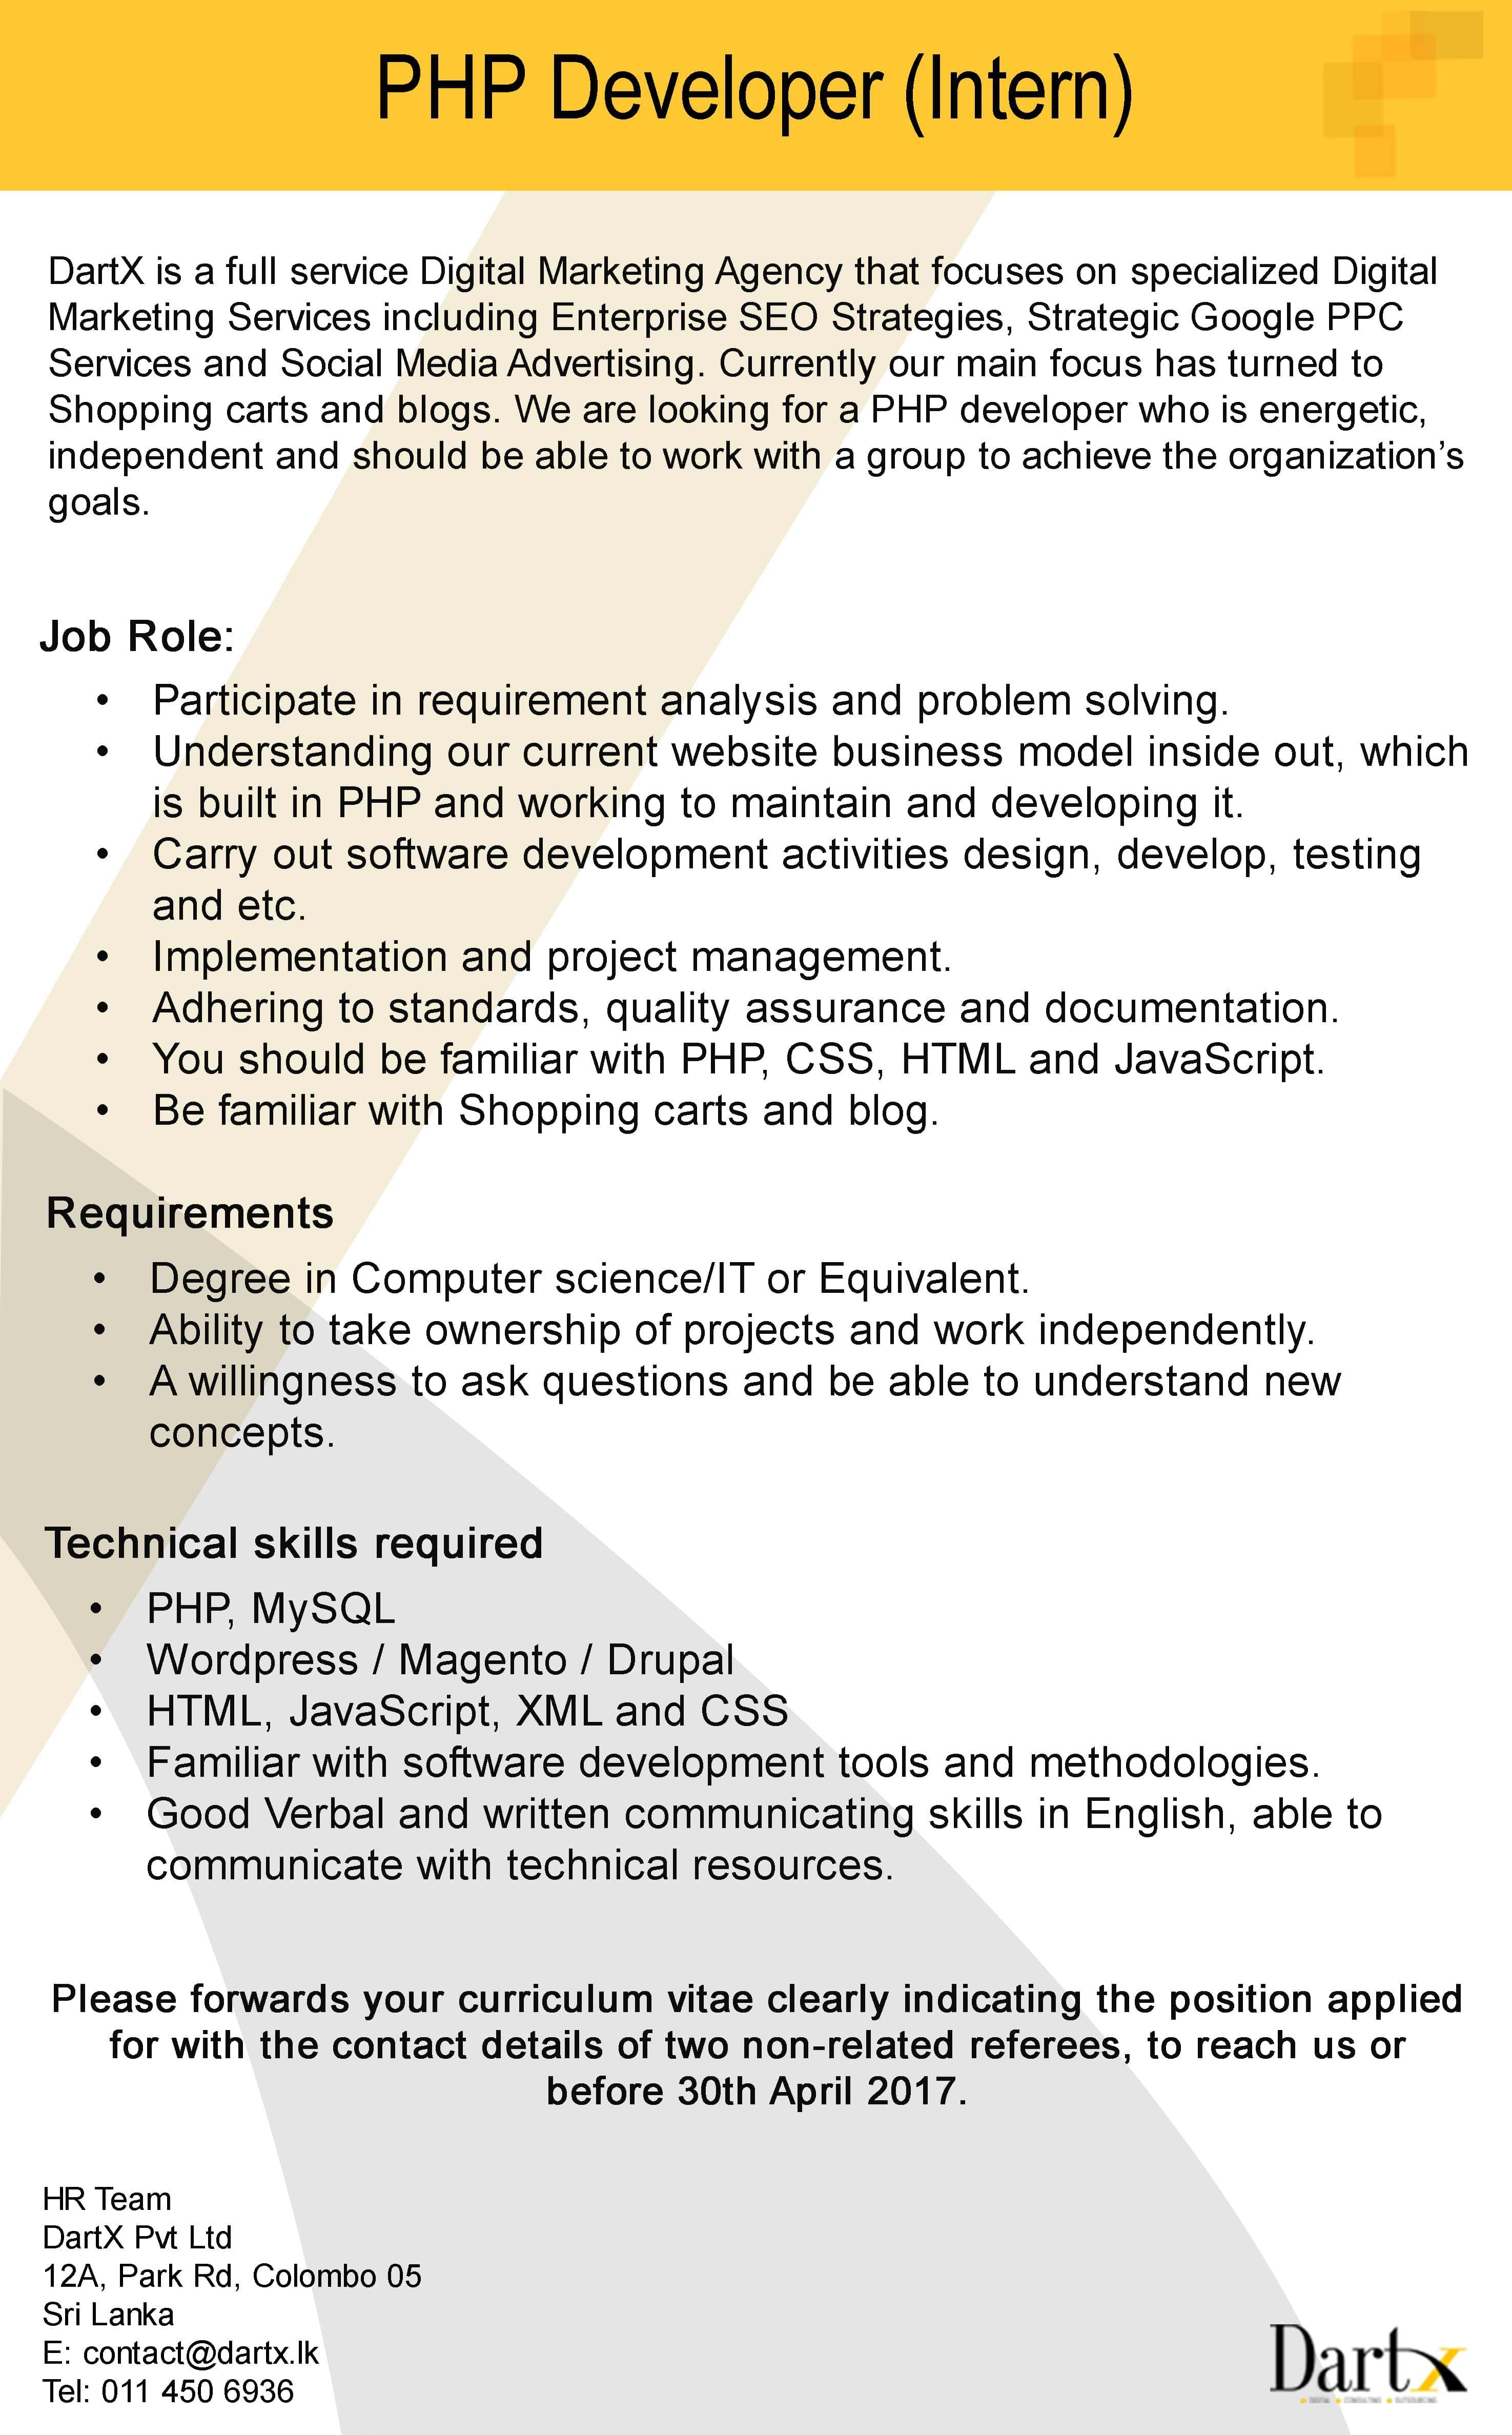 Php Developer Intern At Dartx Pvt Ltd Career First